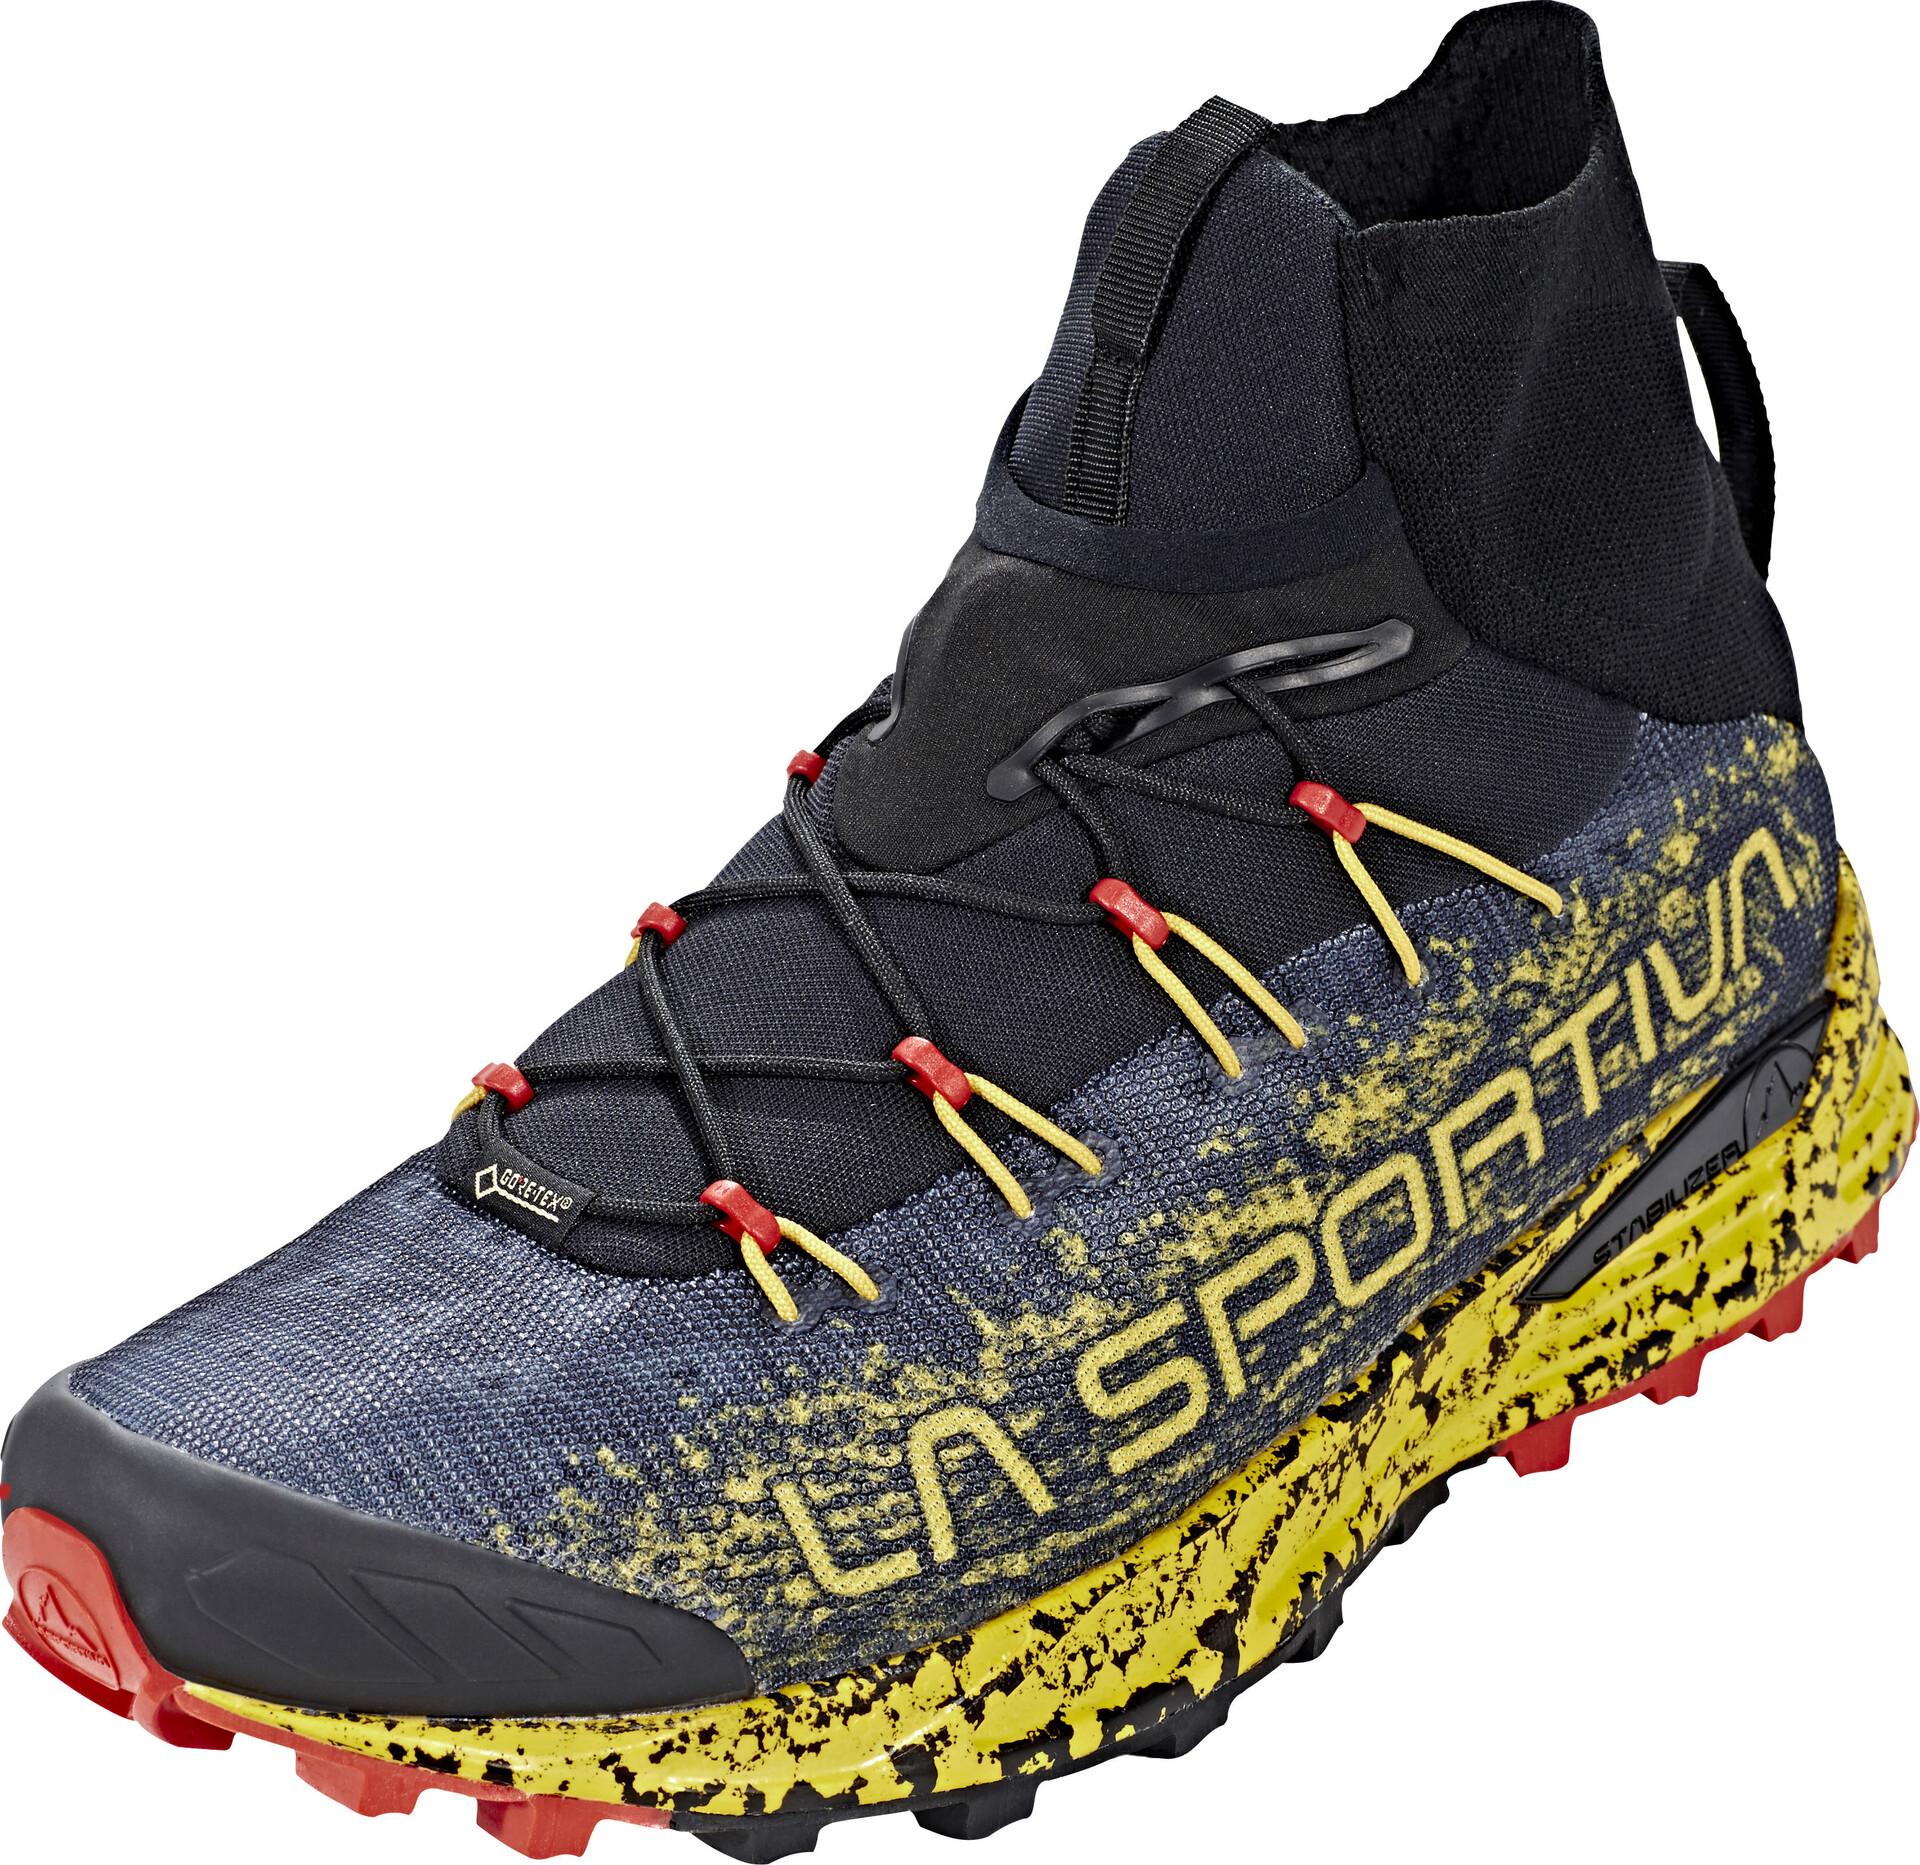 La Uragano Herren Blackyellow Running Gtx Shoes Sportiva QWECrBxode